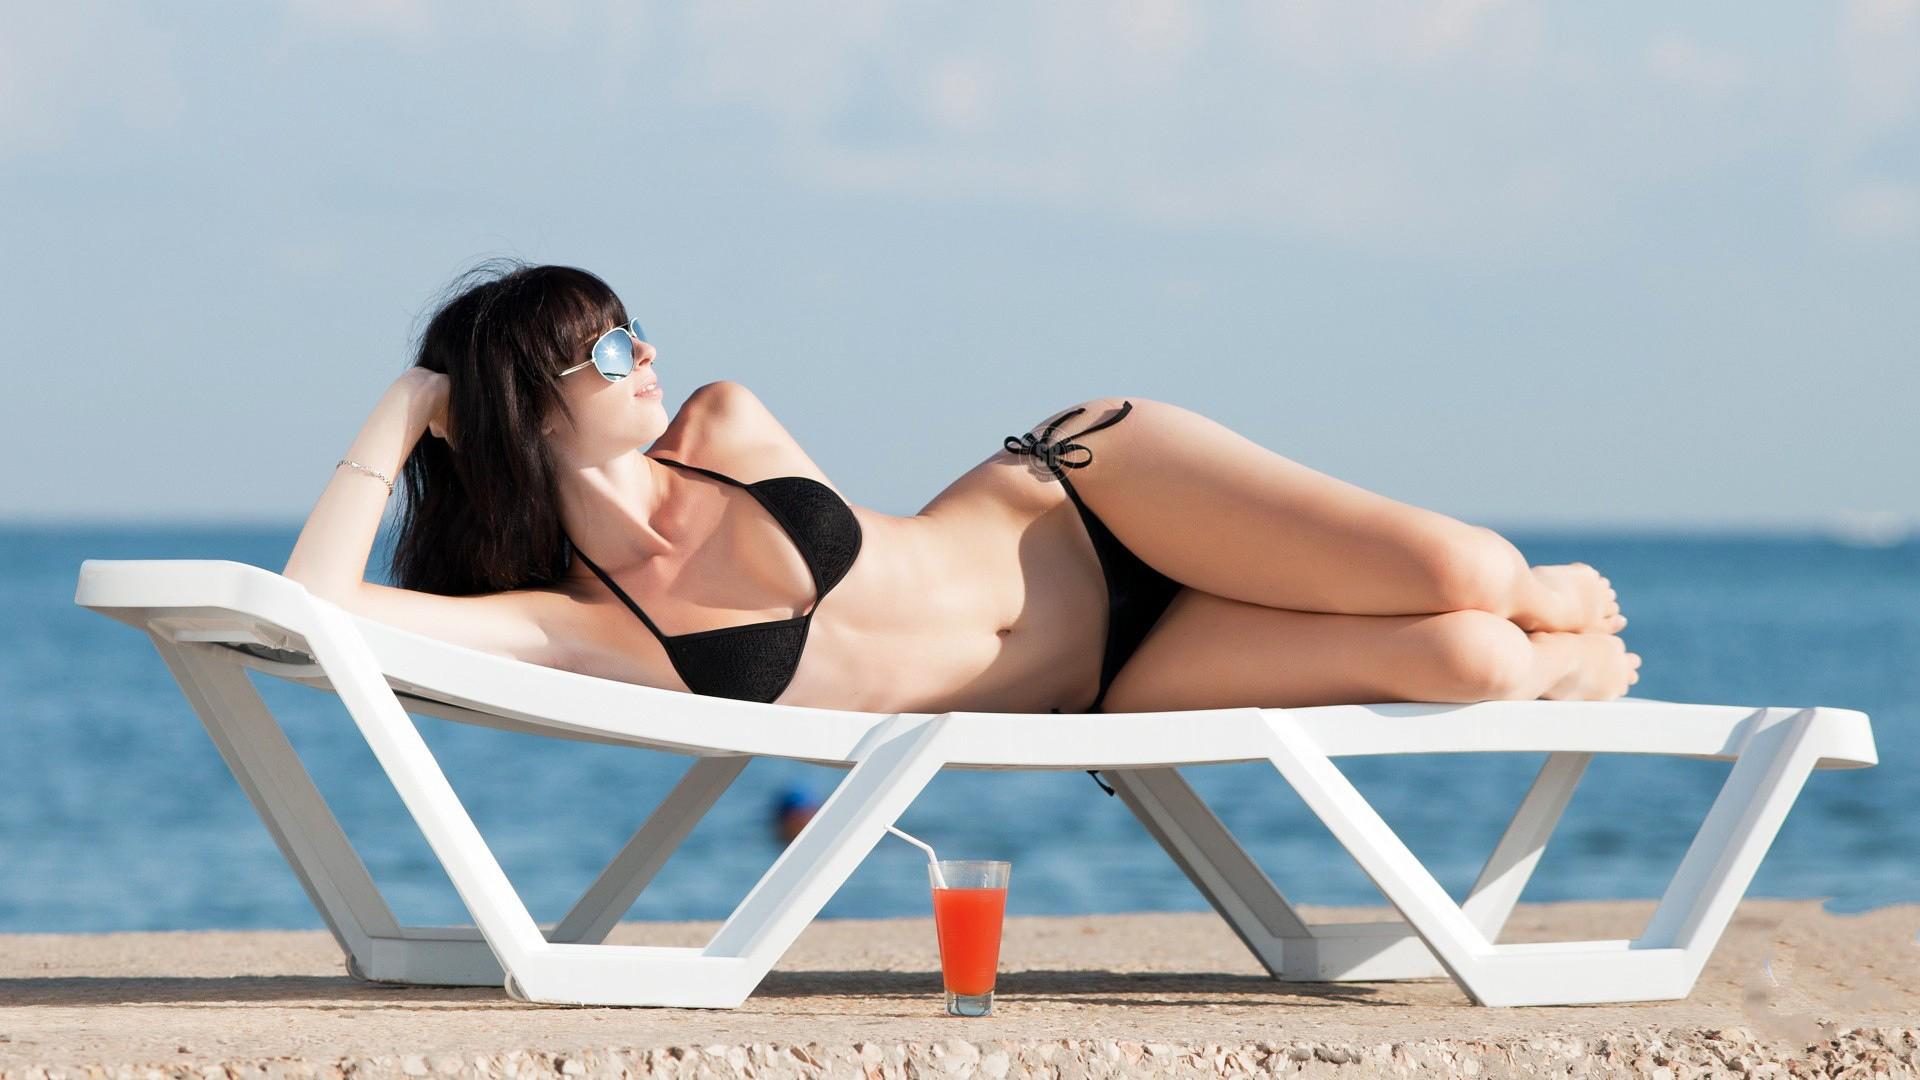 sunbathing-bikini-girls-pictures-women-bodybuilder-fucking